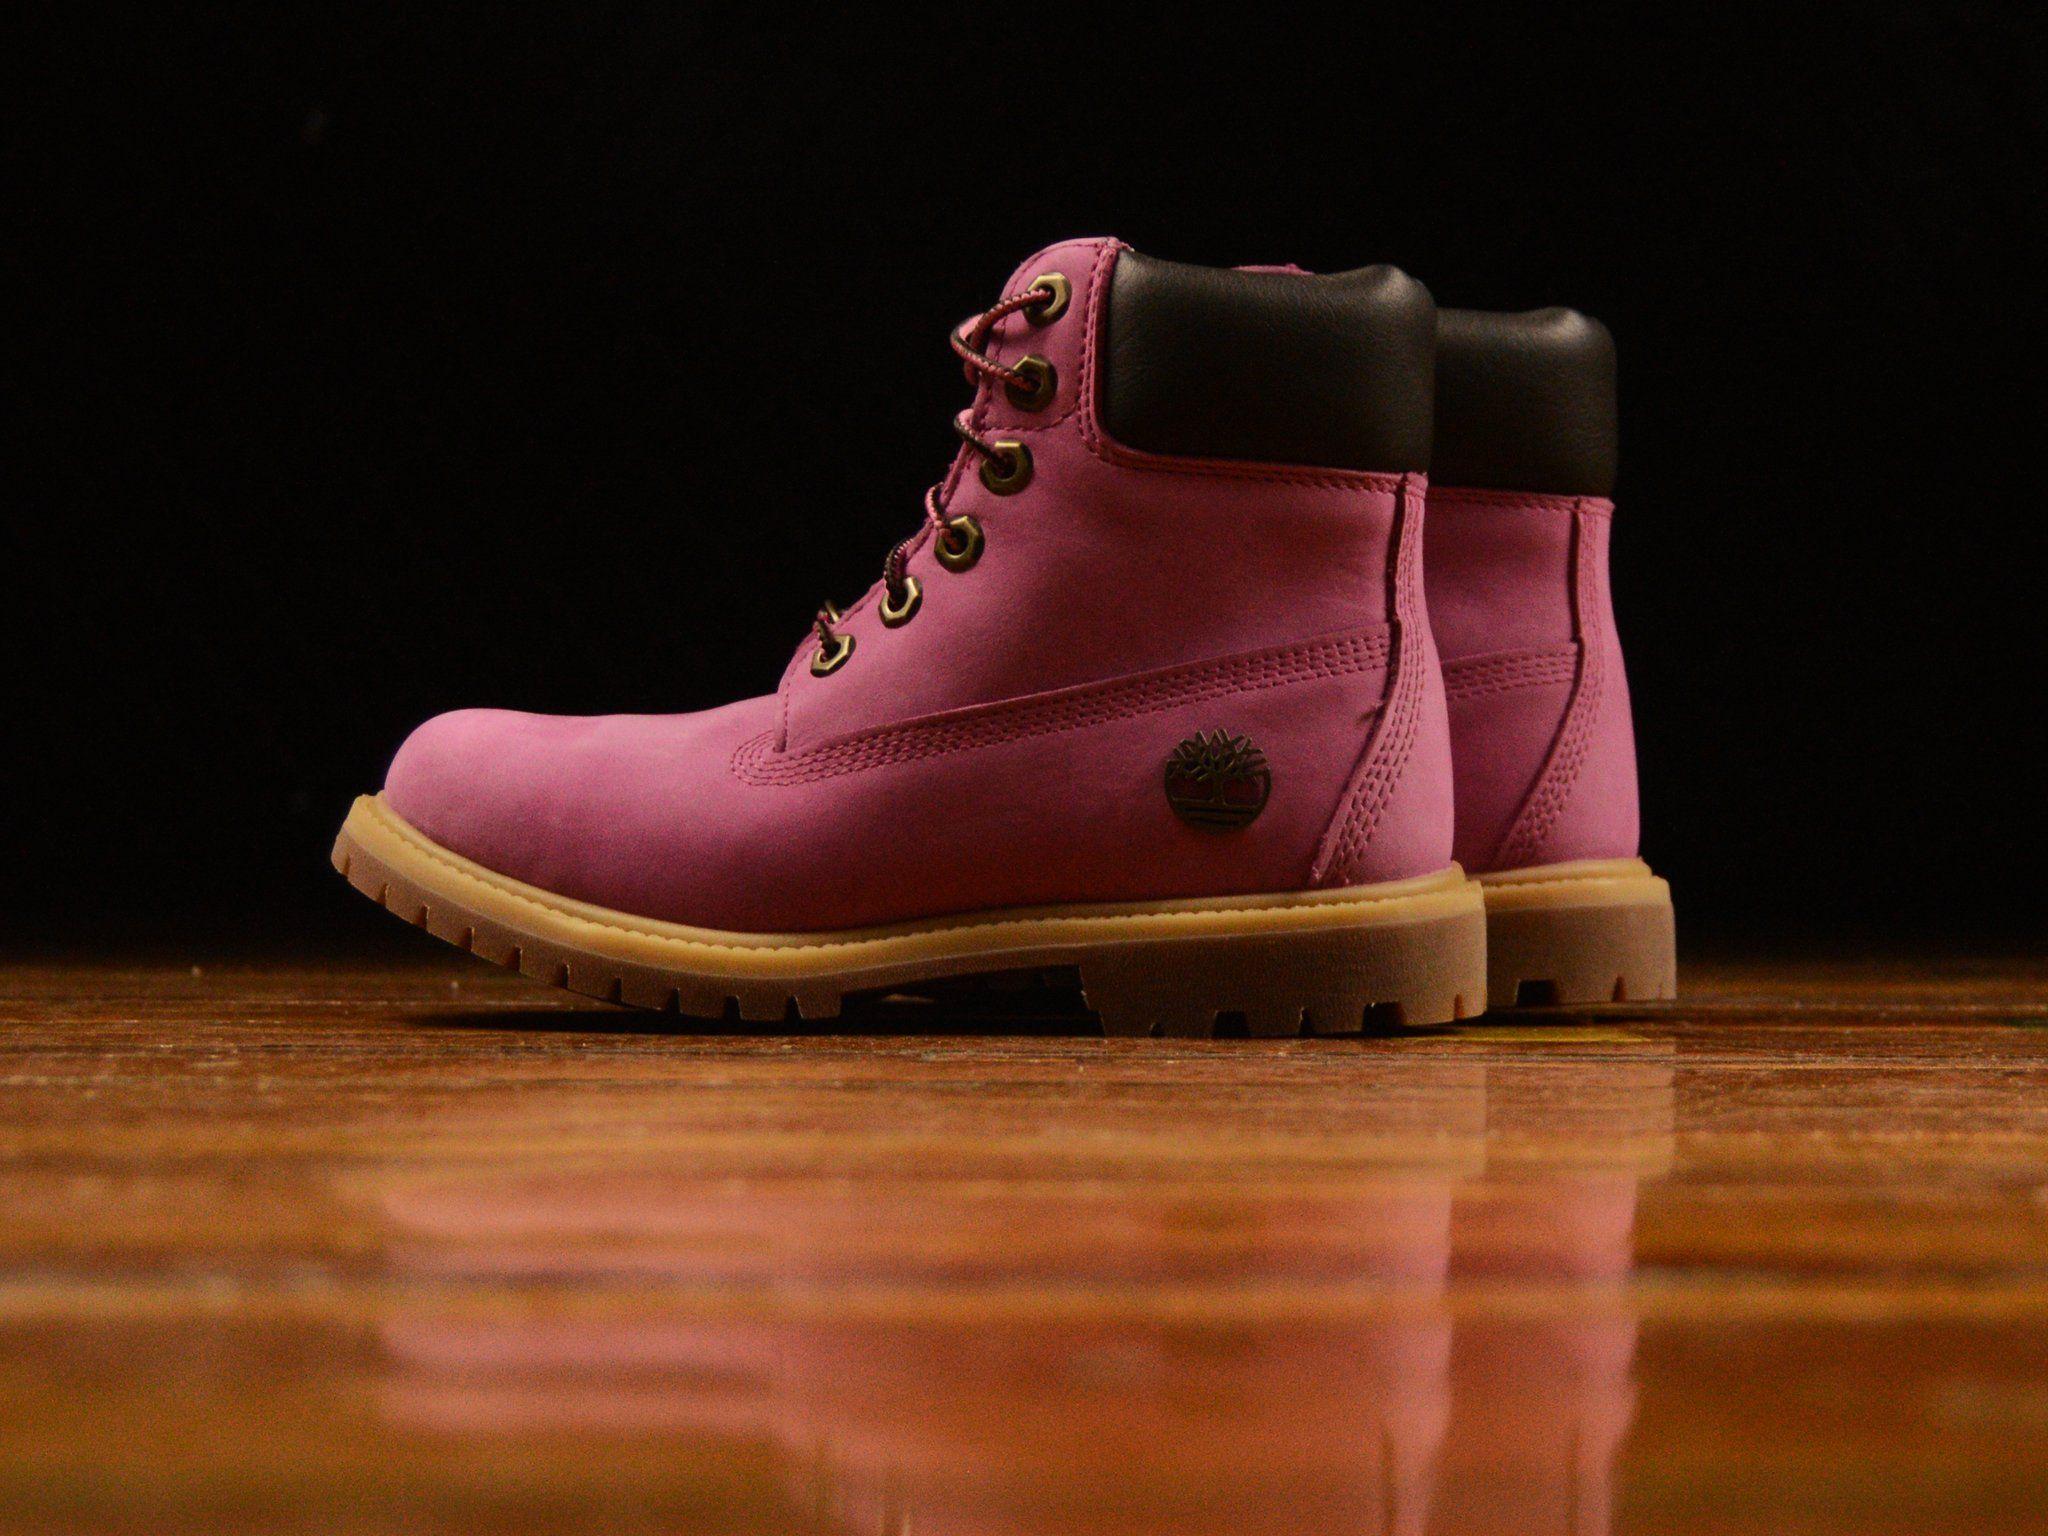 Women's Timberland 6 Inch Premium Waterproof Boots 'Susan G